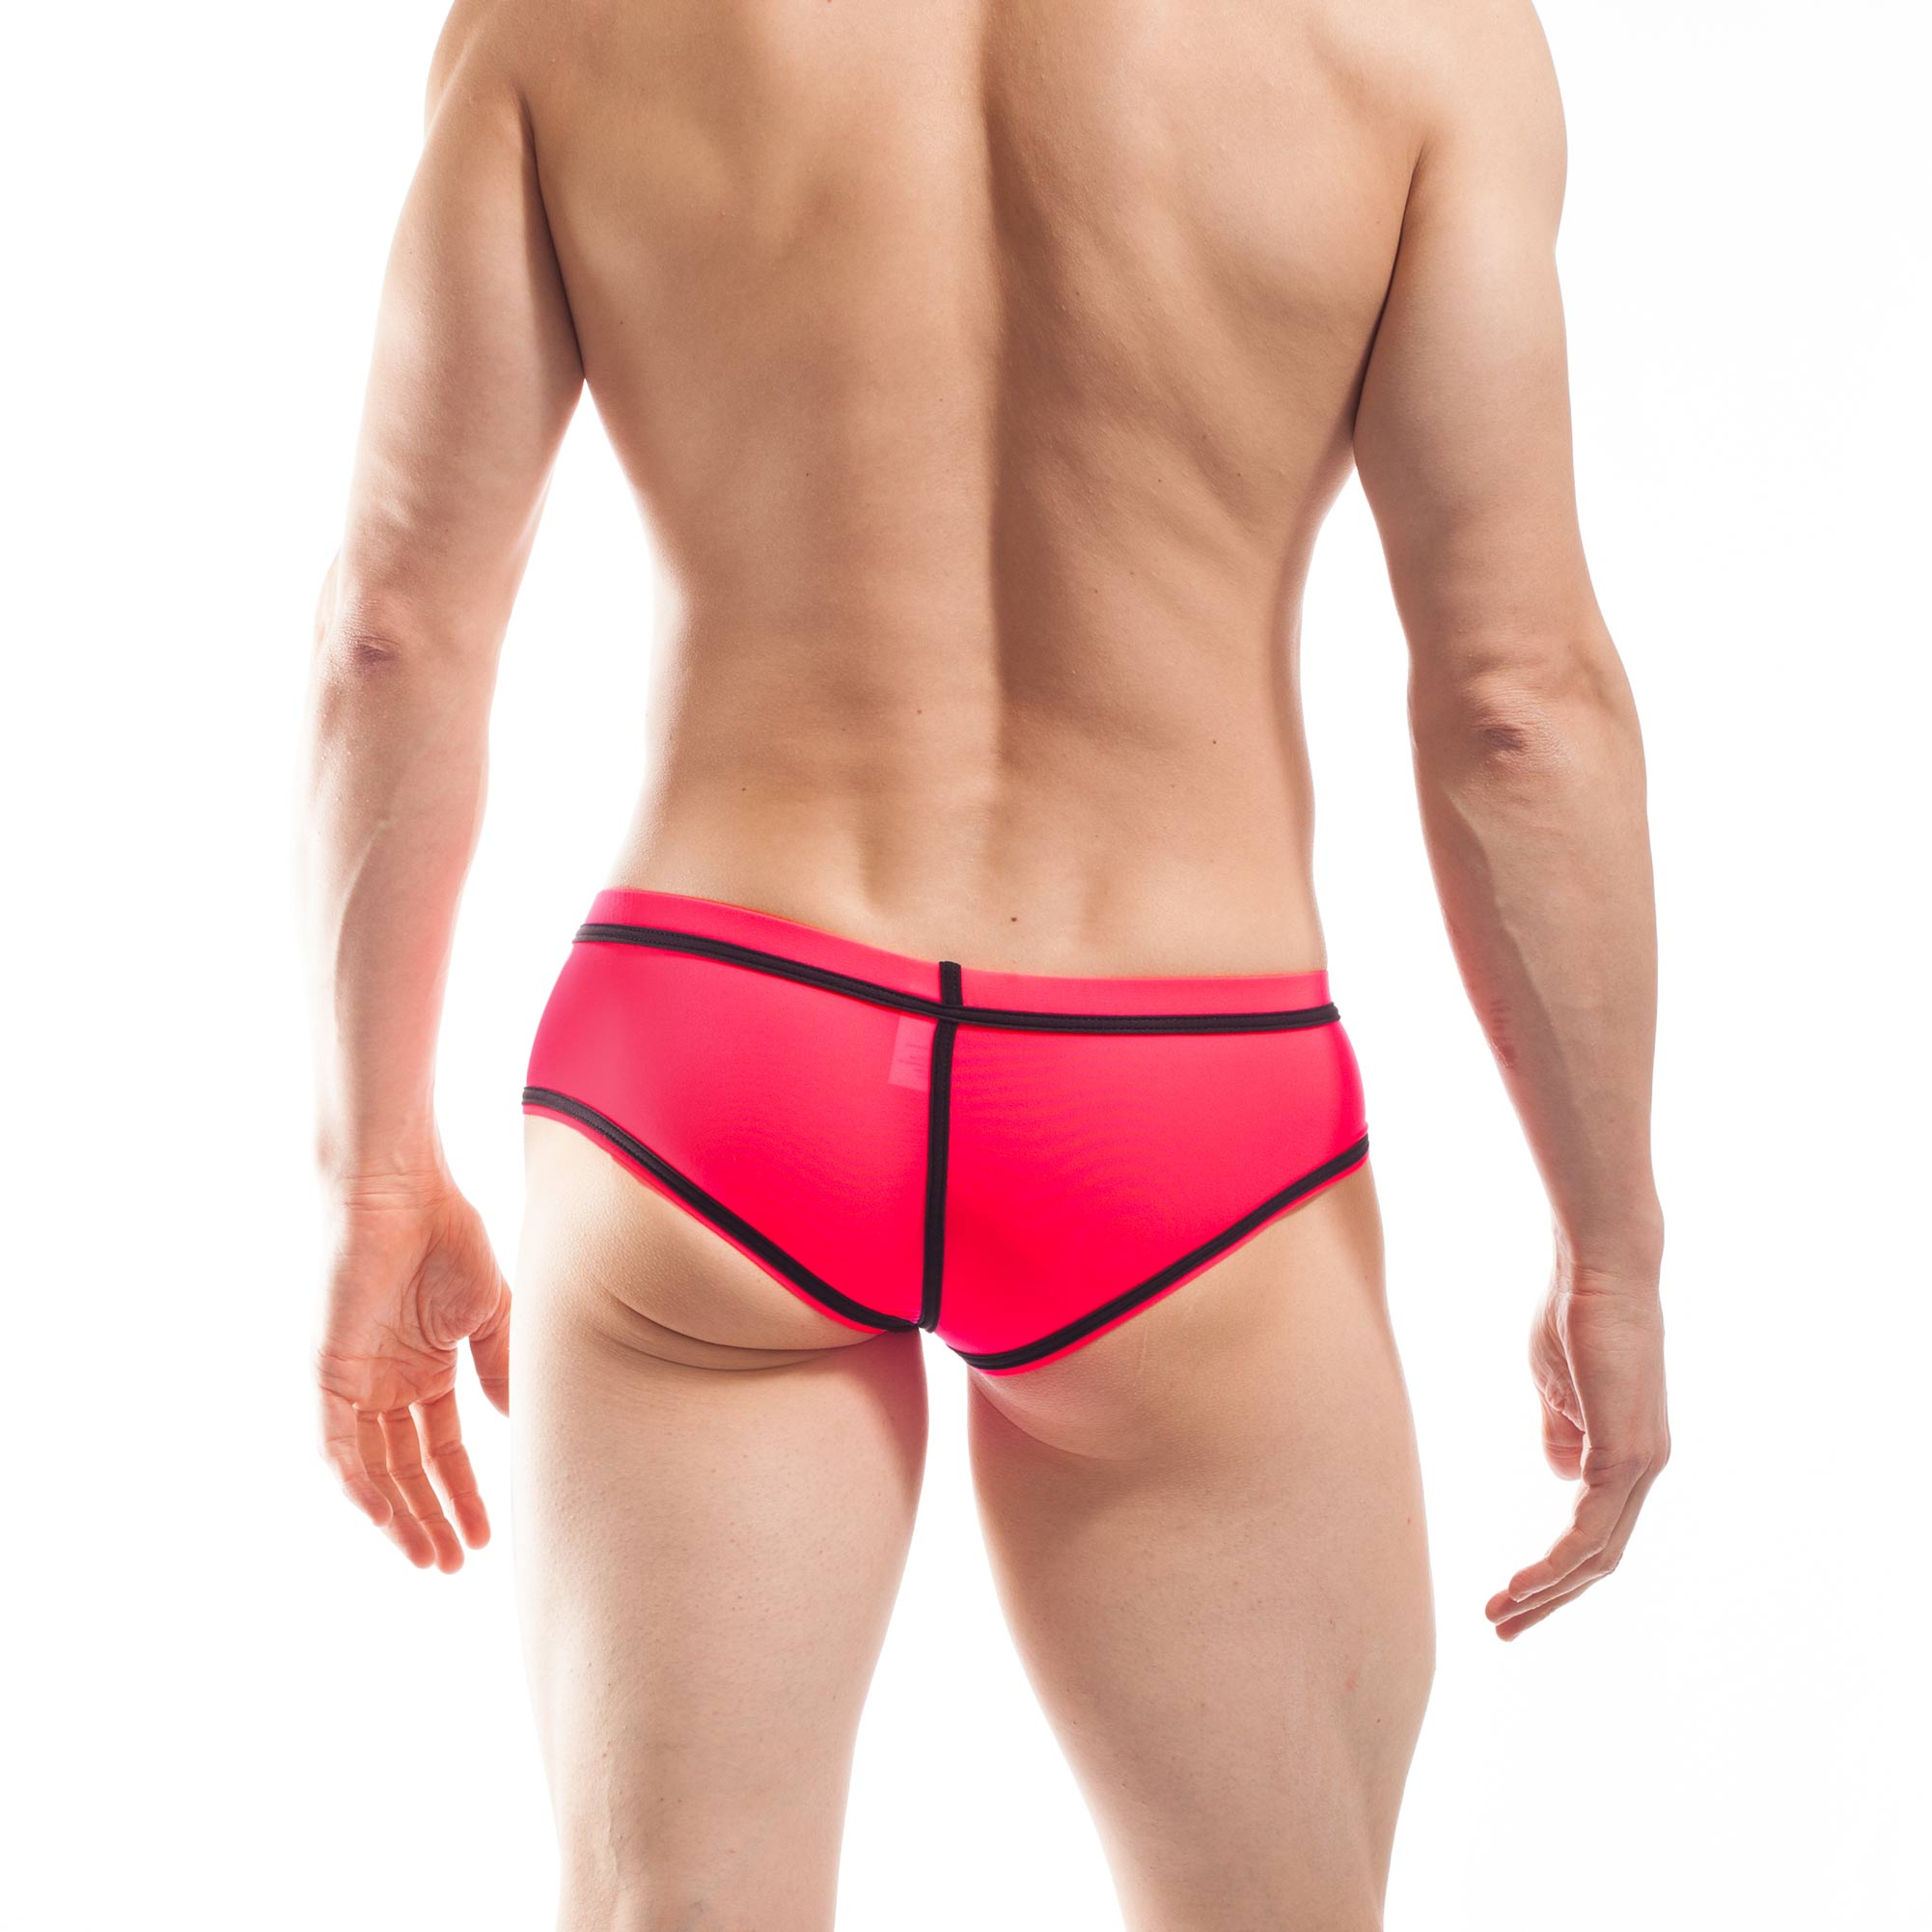 BEUN STRIPE HIPSTER, Pant, Shorts, enganliegende Badehose, Unterhose, swim trunks, kontrast Ränder, schwarze Börtchen, neon coral, neon rot-pink